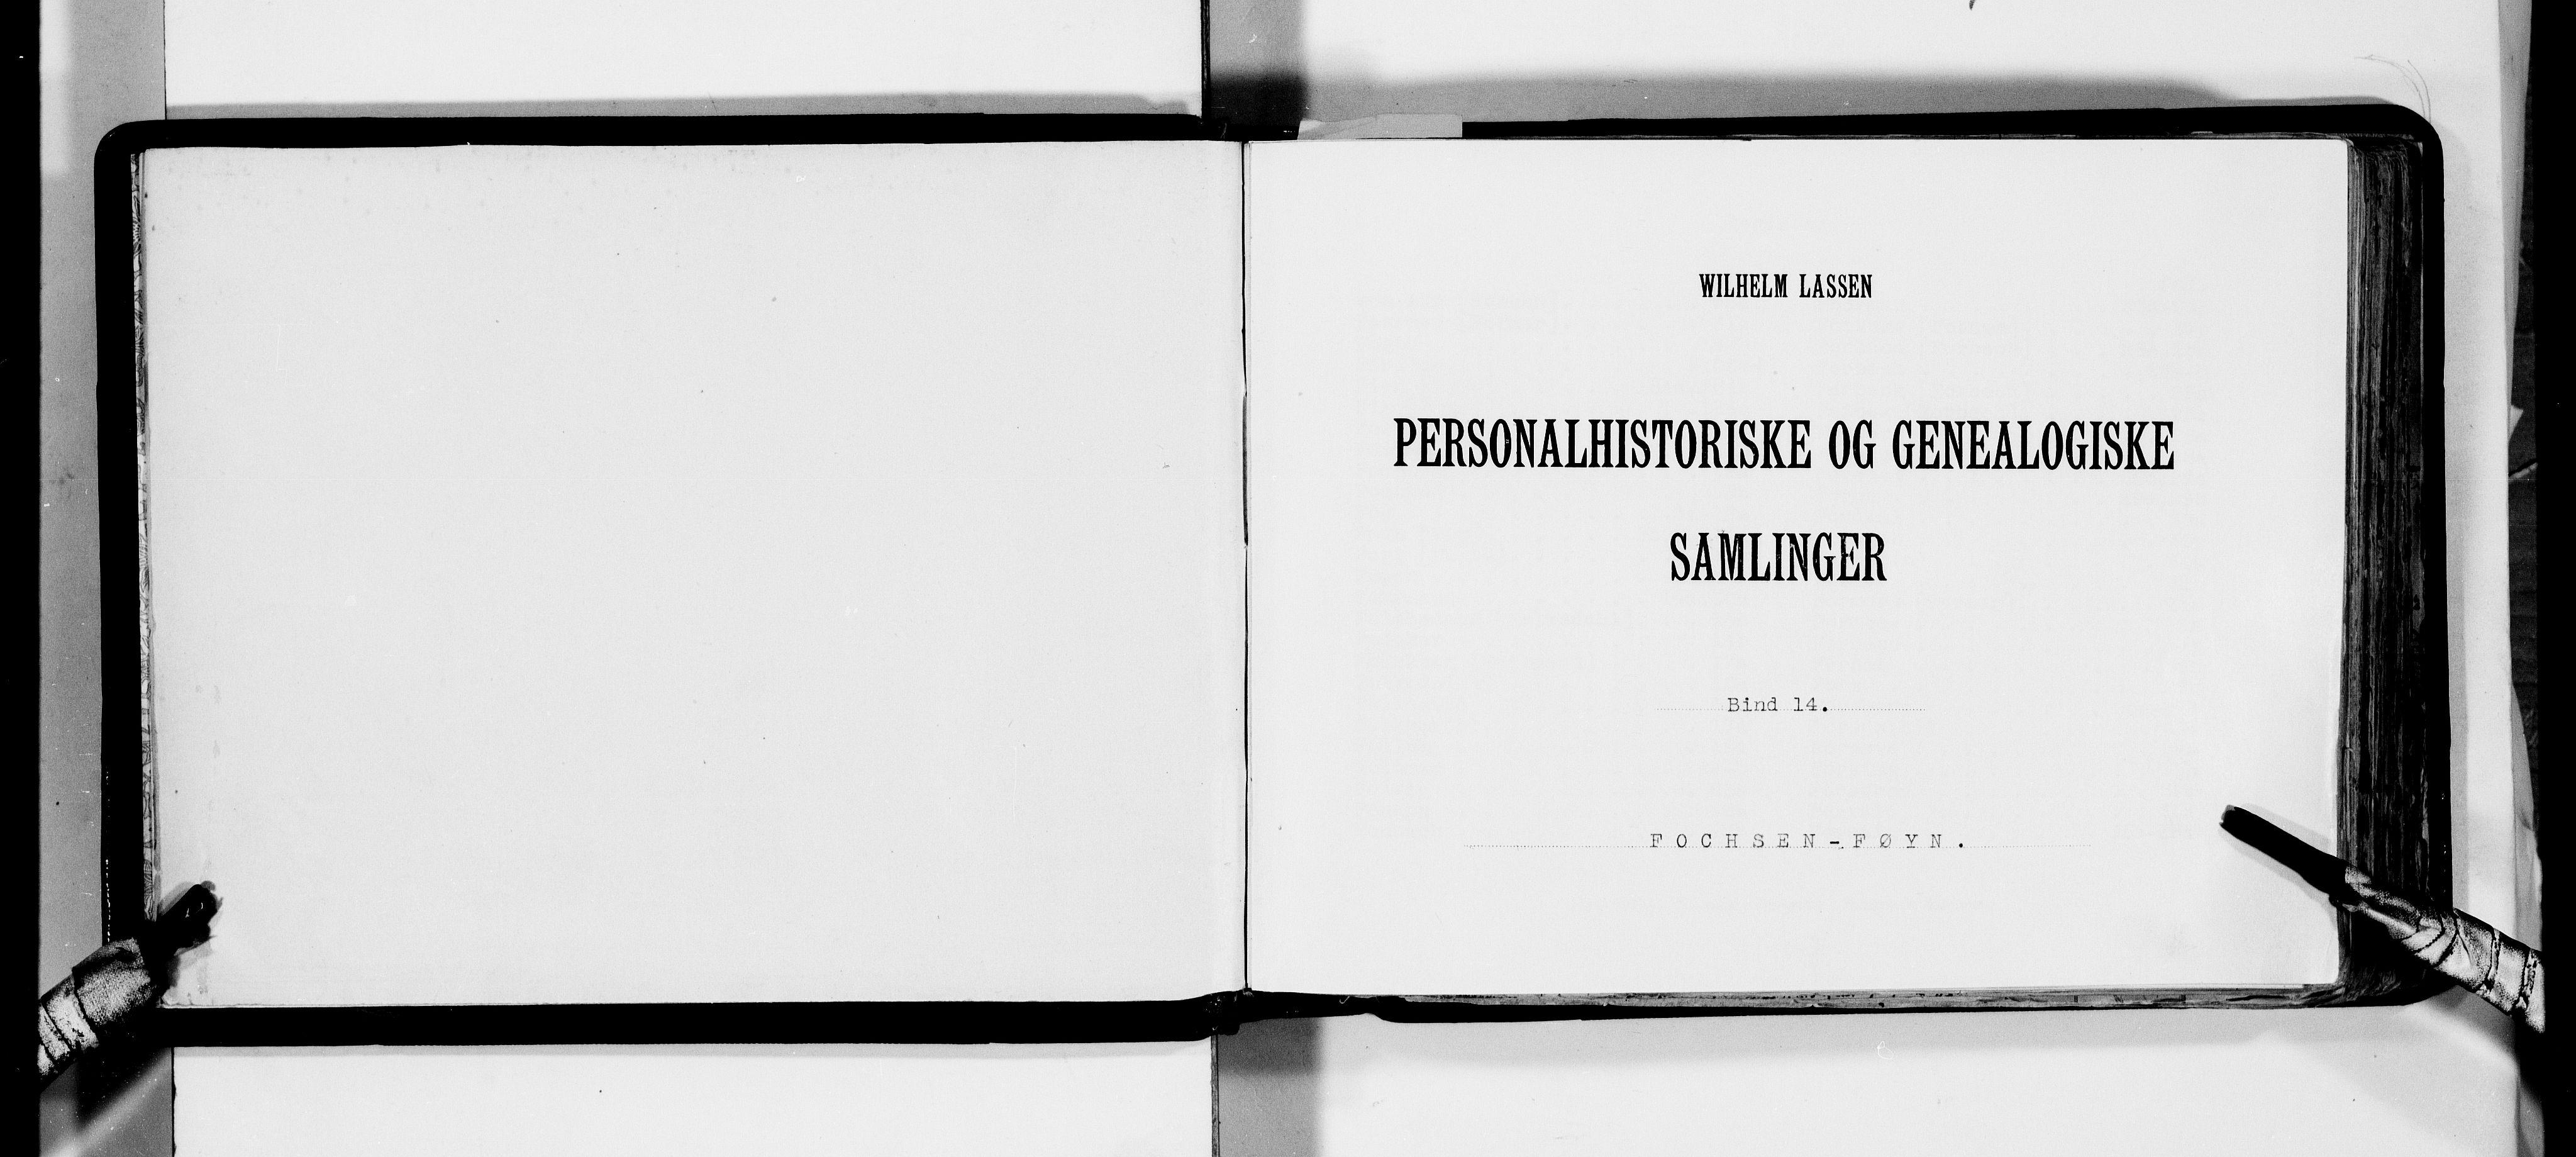 RA, Lassens samlinger, F/Fa, s. upaginert